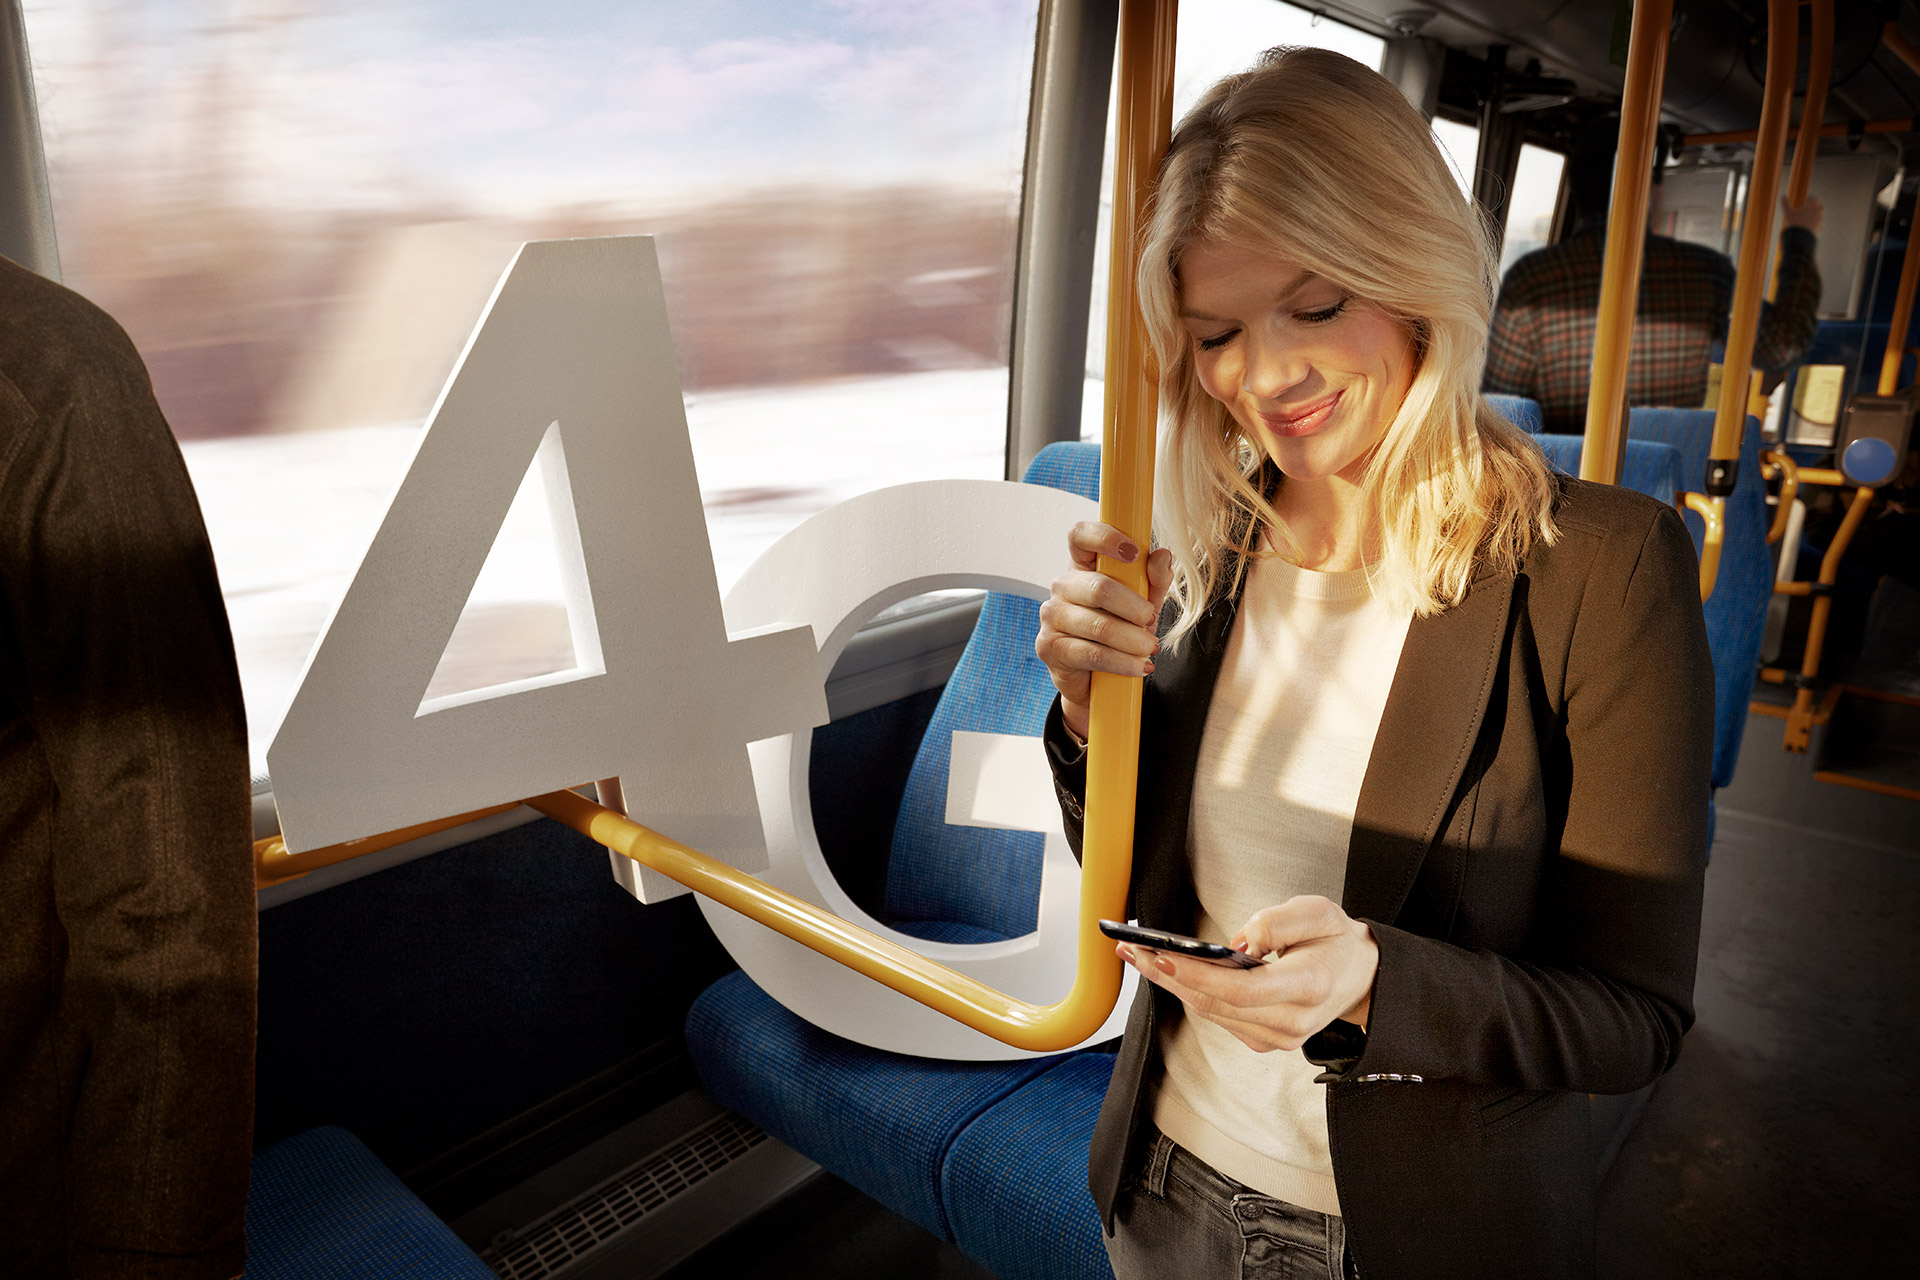 bus_new